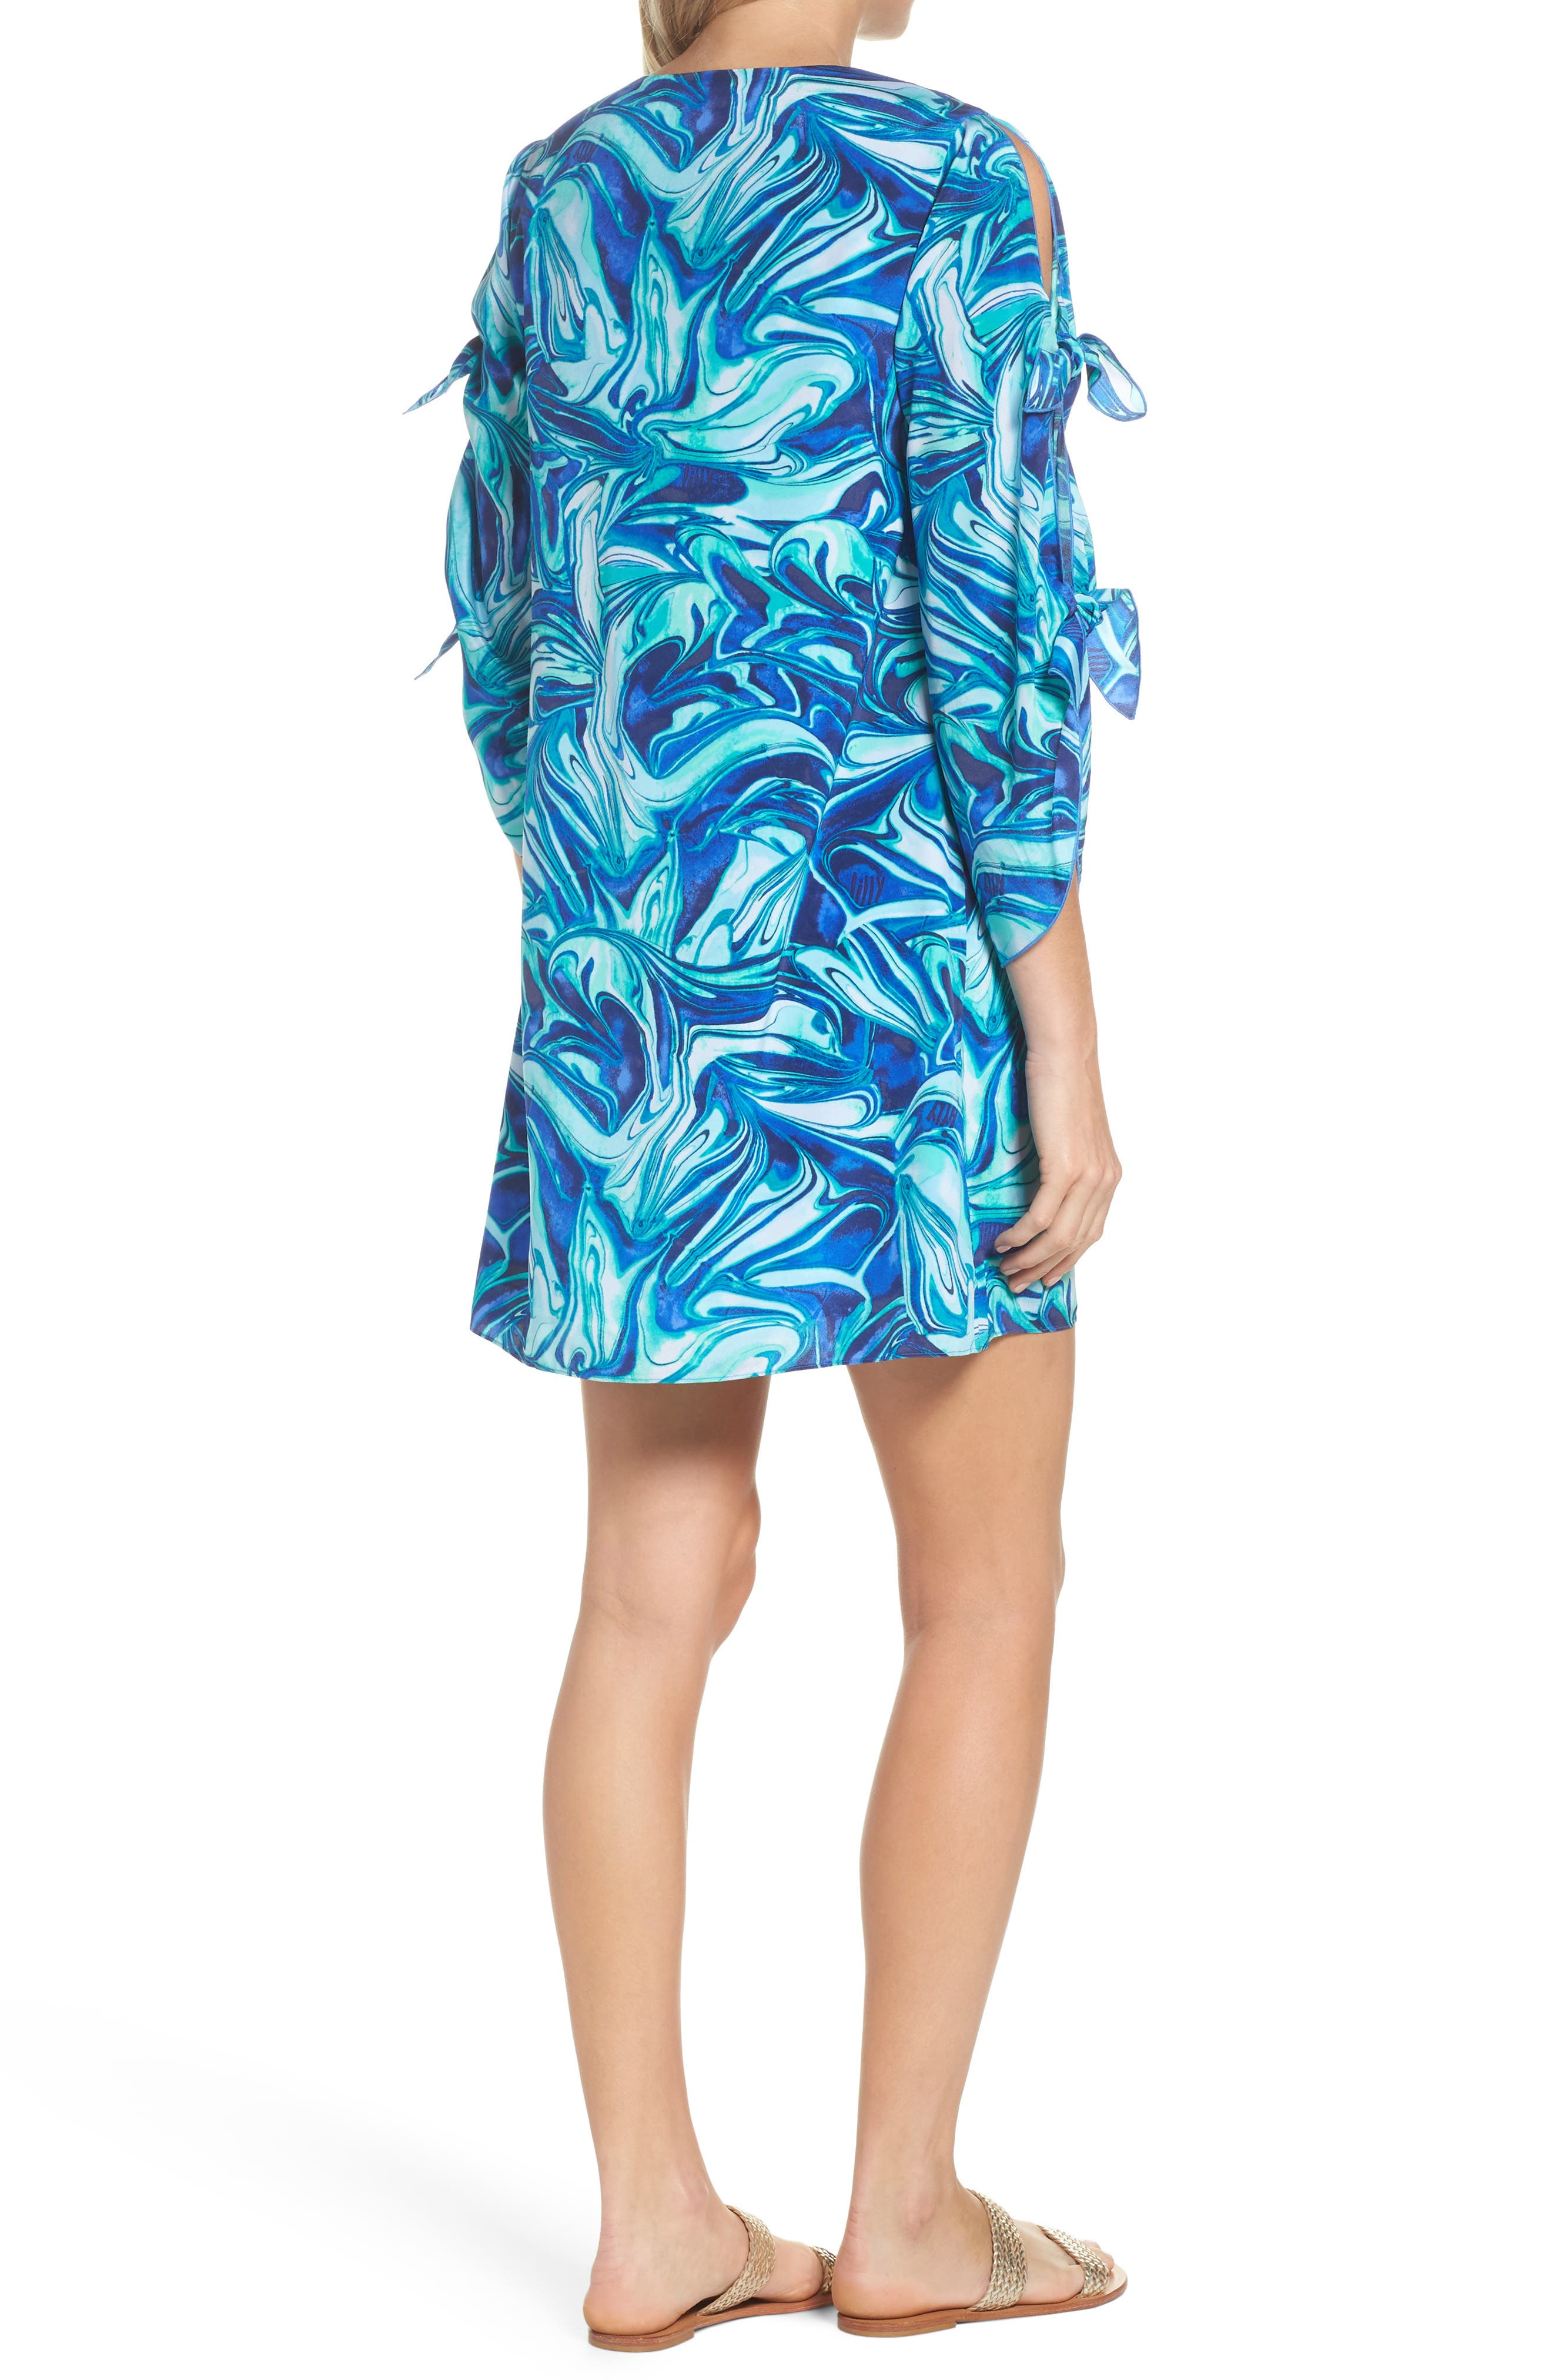 Avila Shift Dress,                             Alternate thumbnail 2, color,                             Ikat Blue Ocean Waves